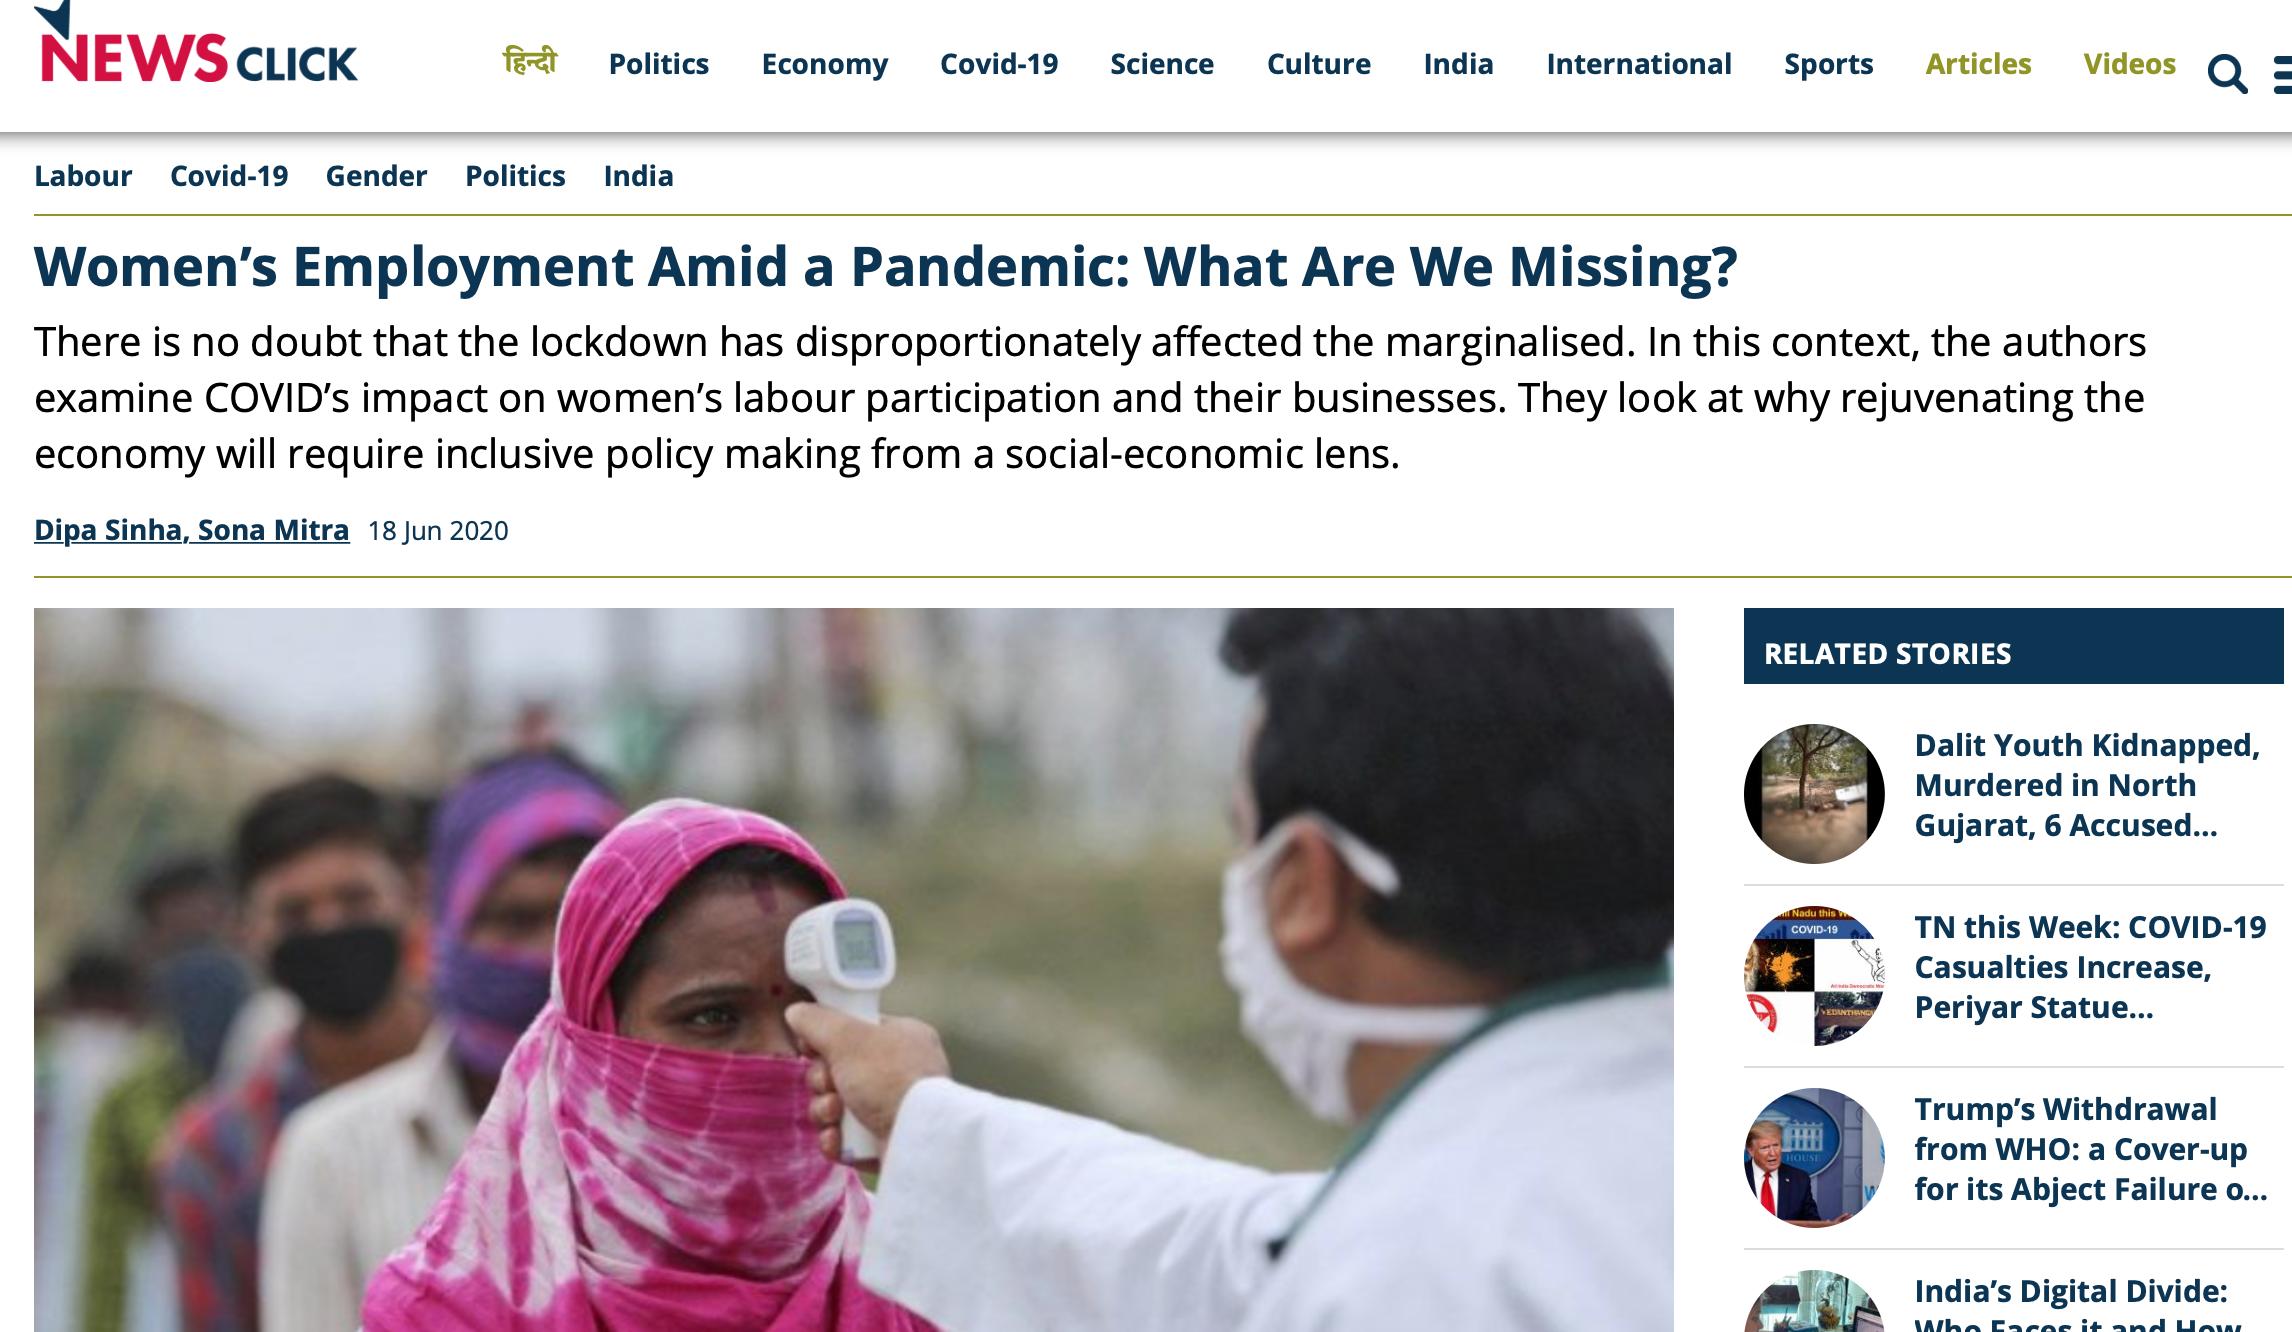 Women's Employment Amid a pandemic